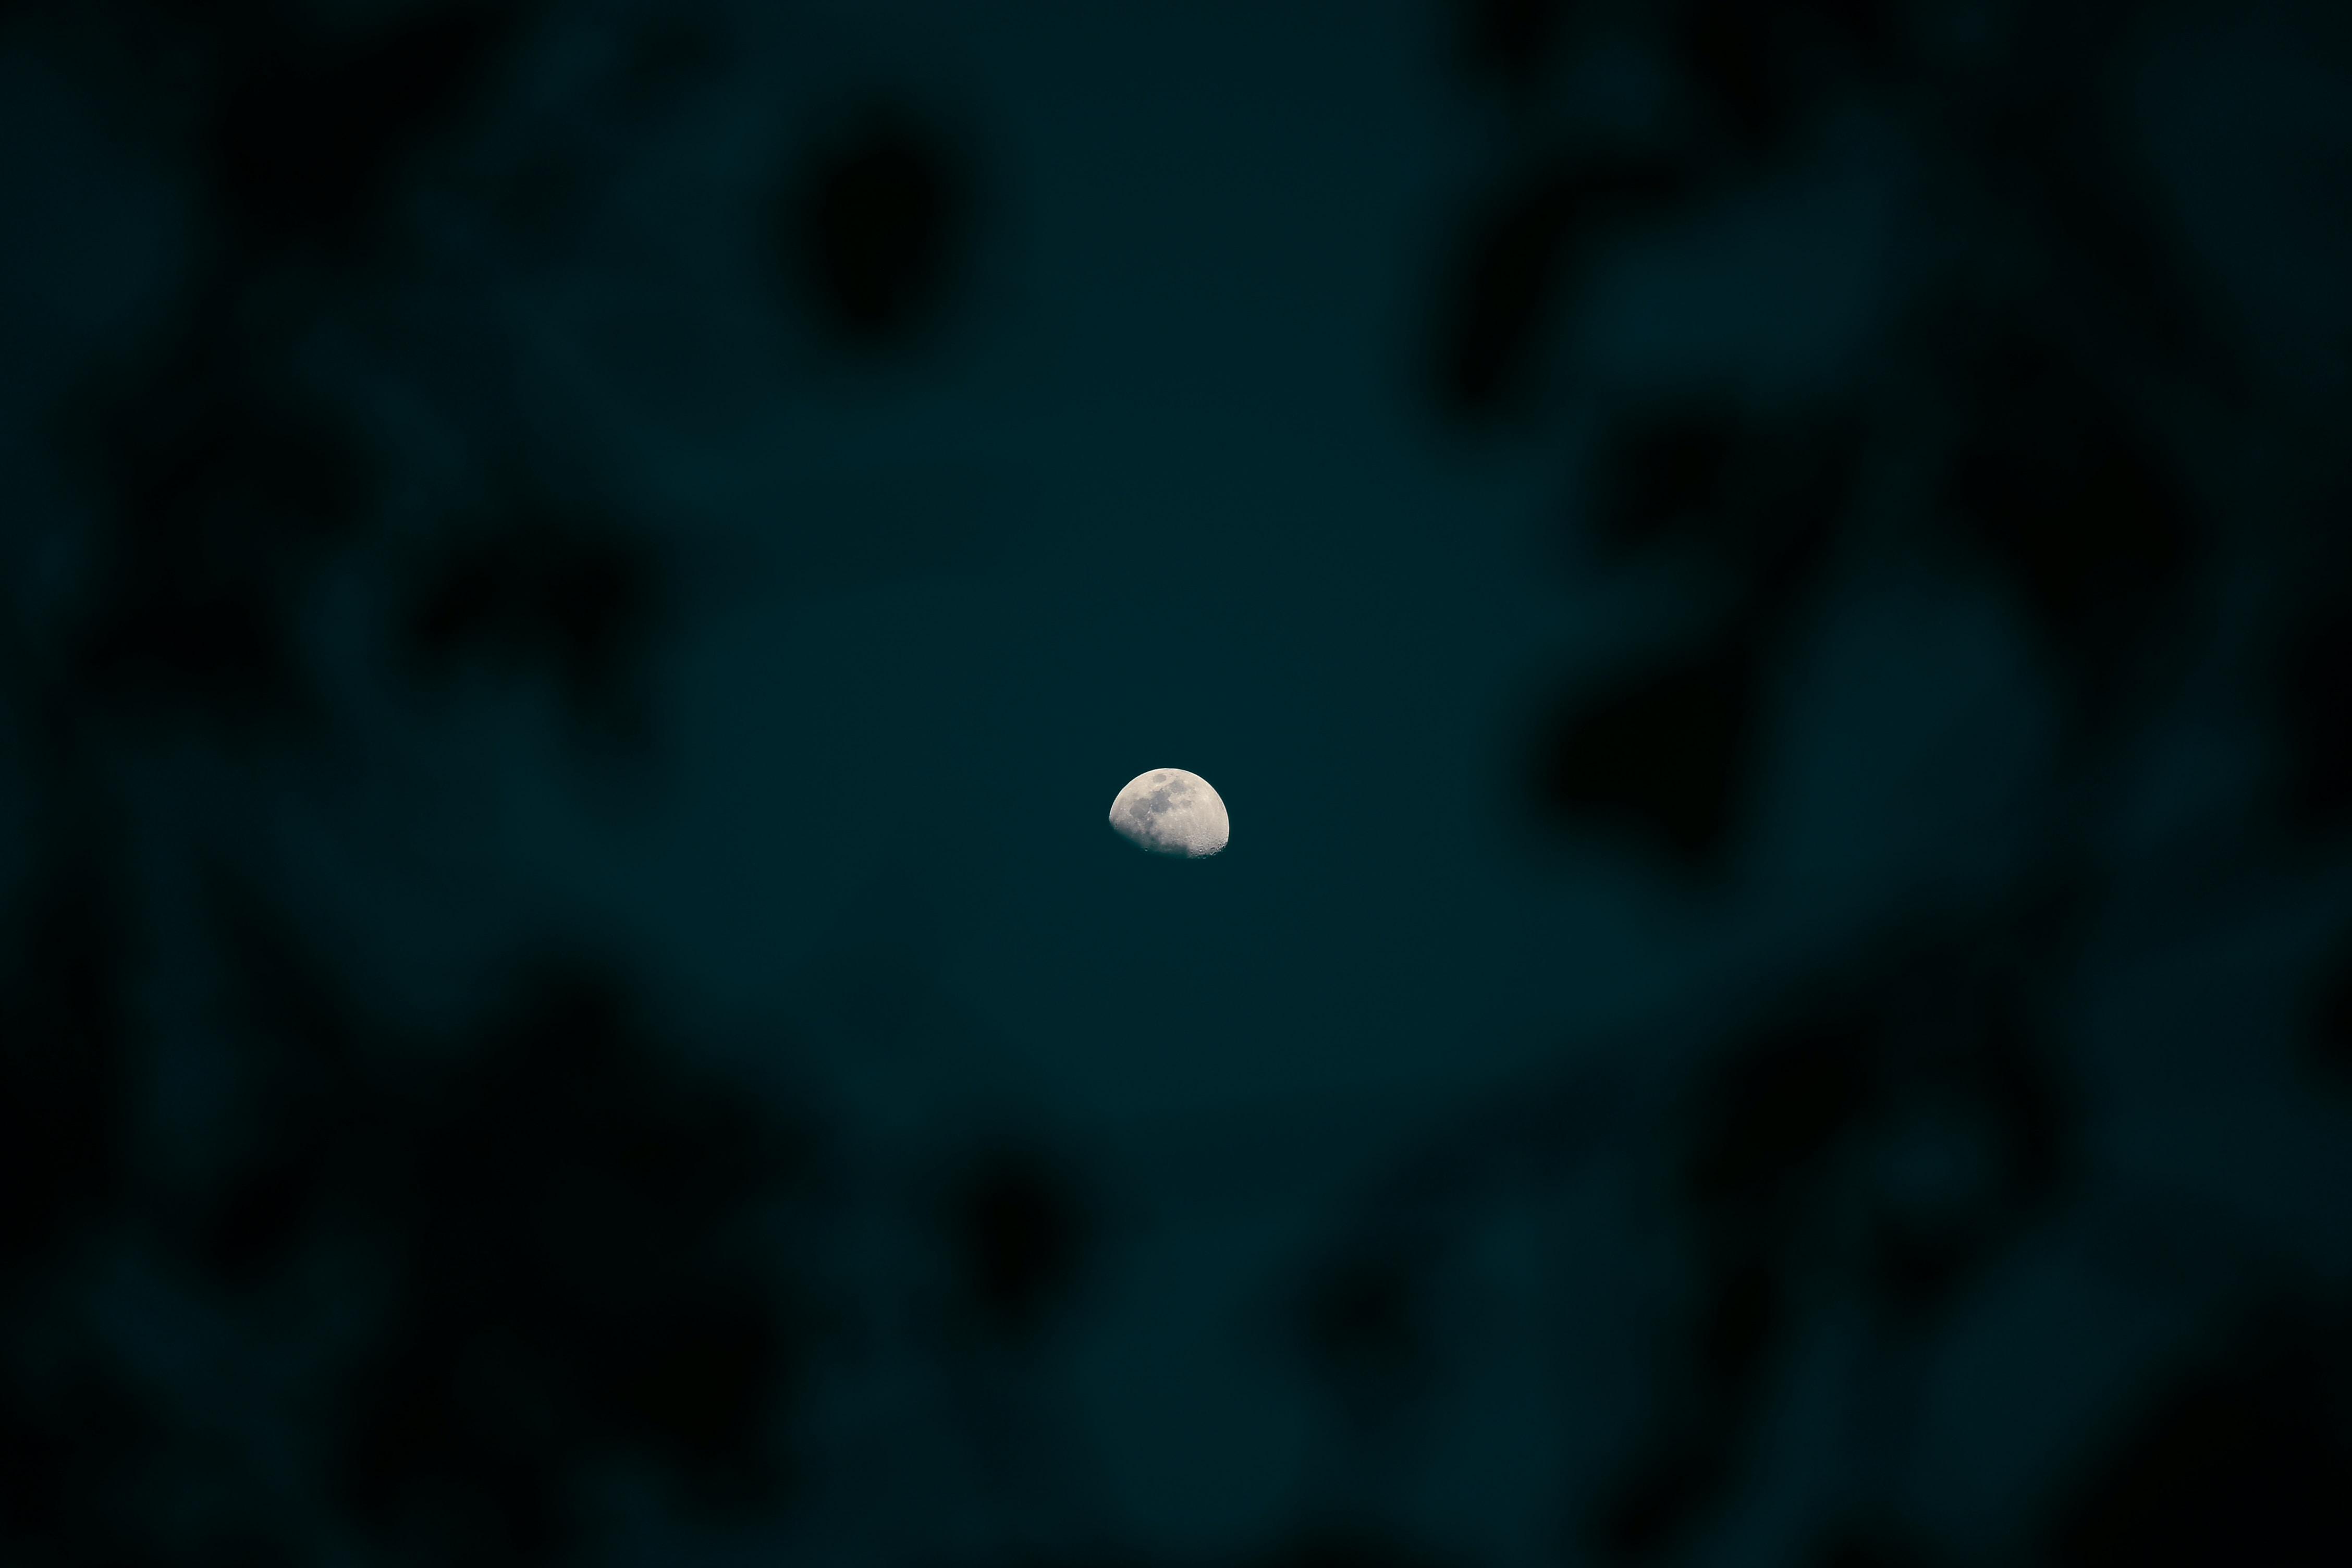 The half moon visible through a net of branches